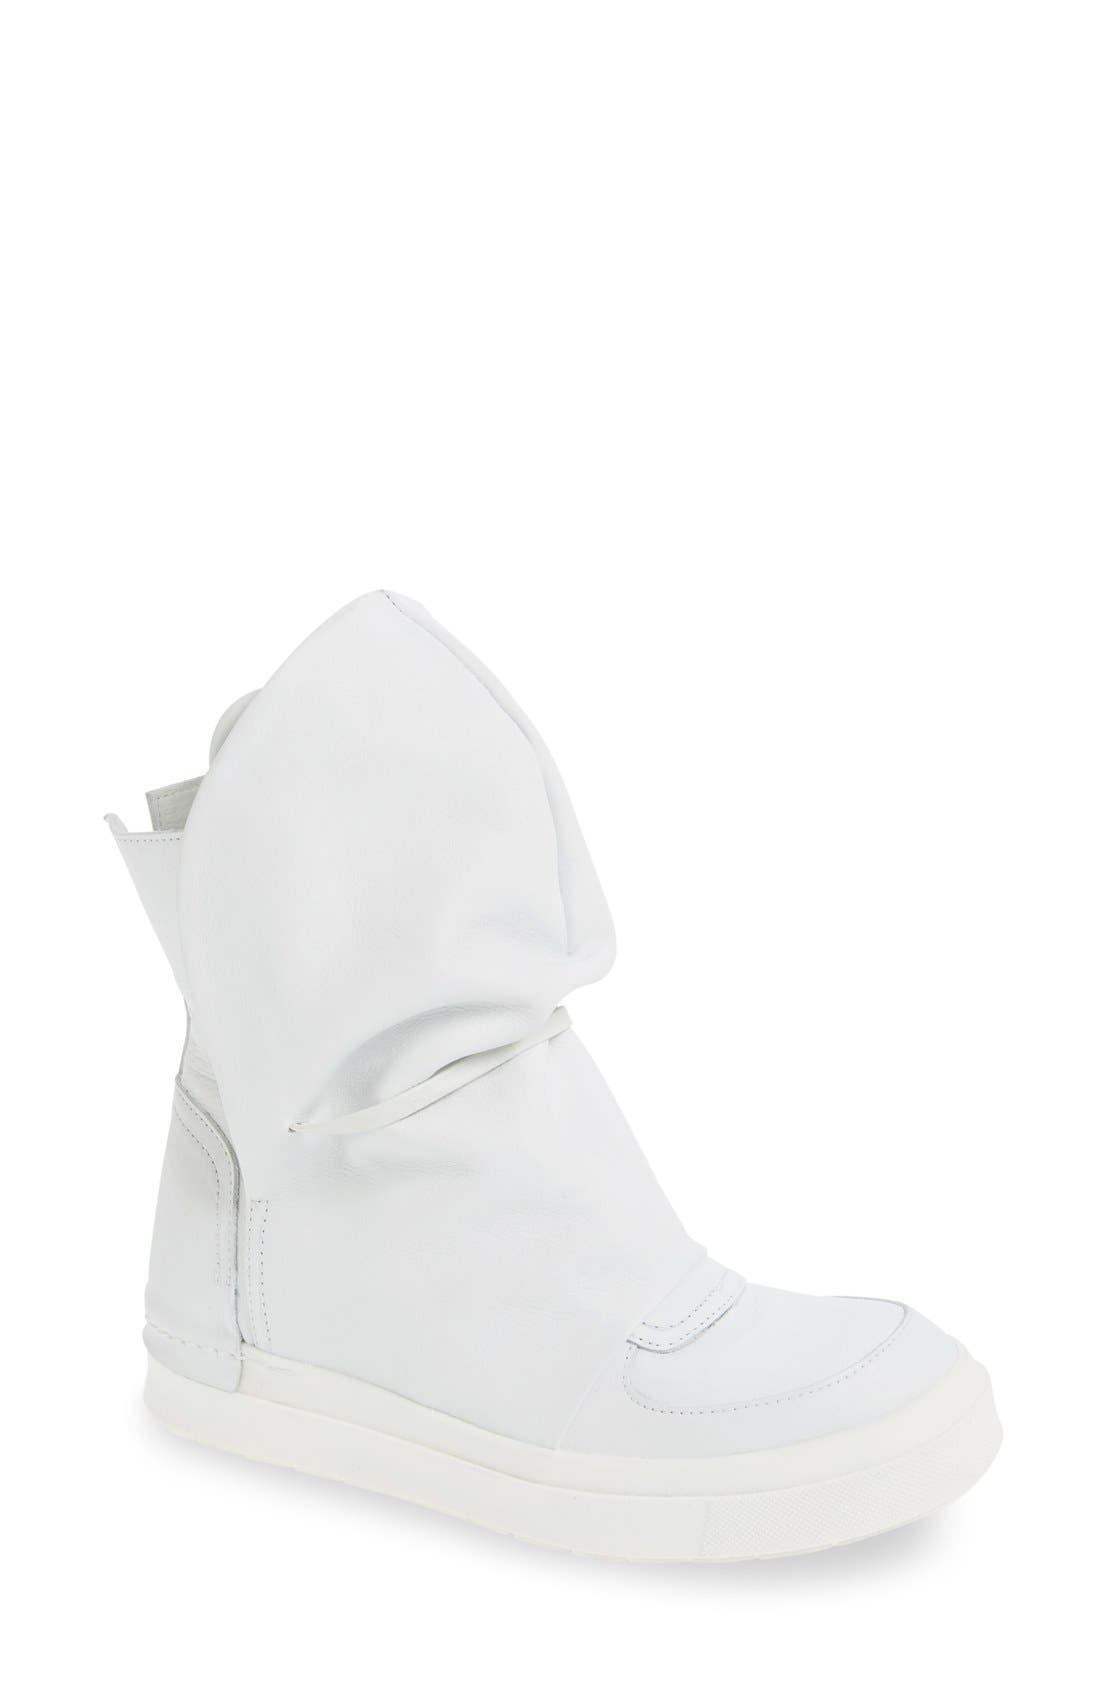 Main Image - CA by CINZIA ARAIA Hidden Wedge Sneaker Boot (Women)